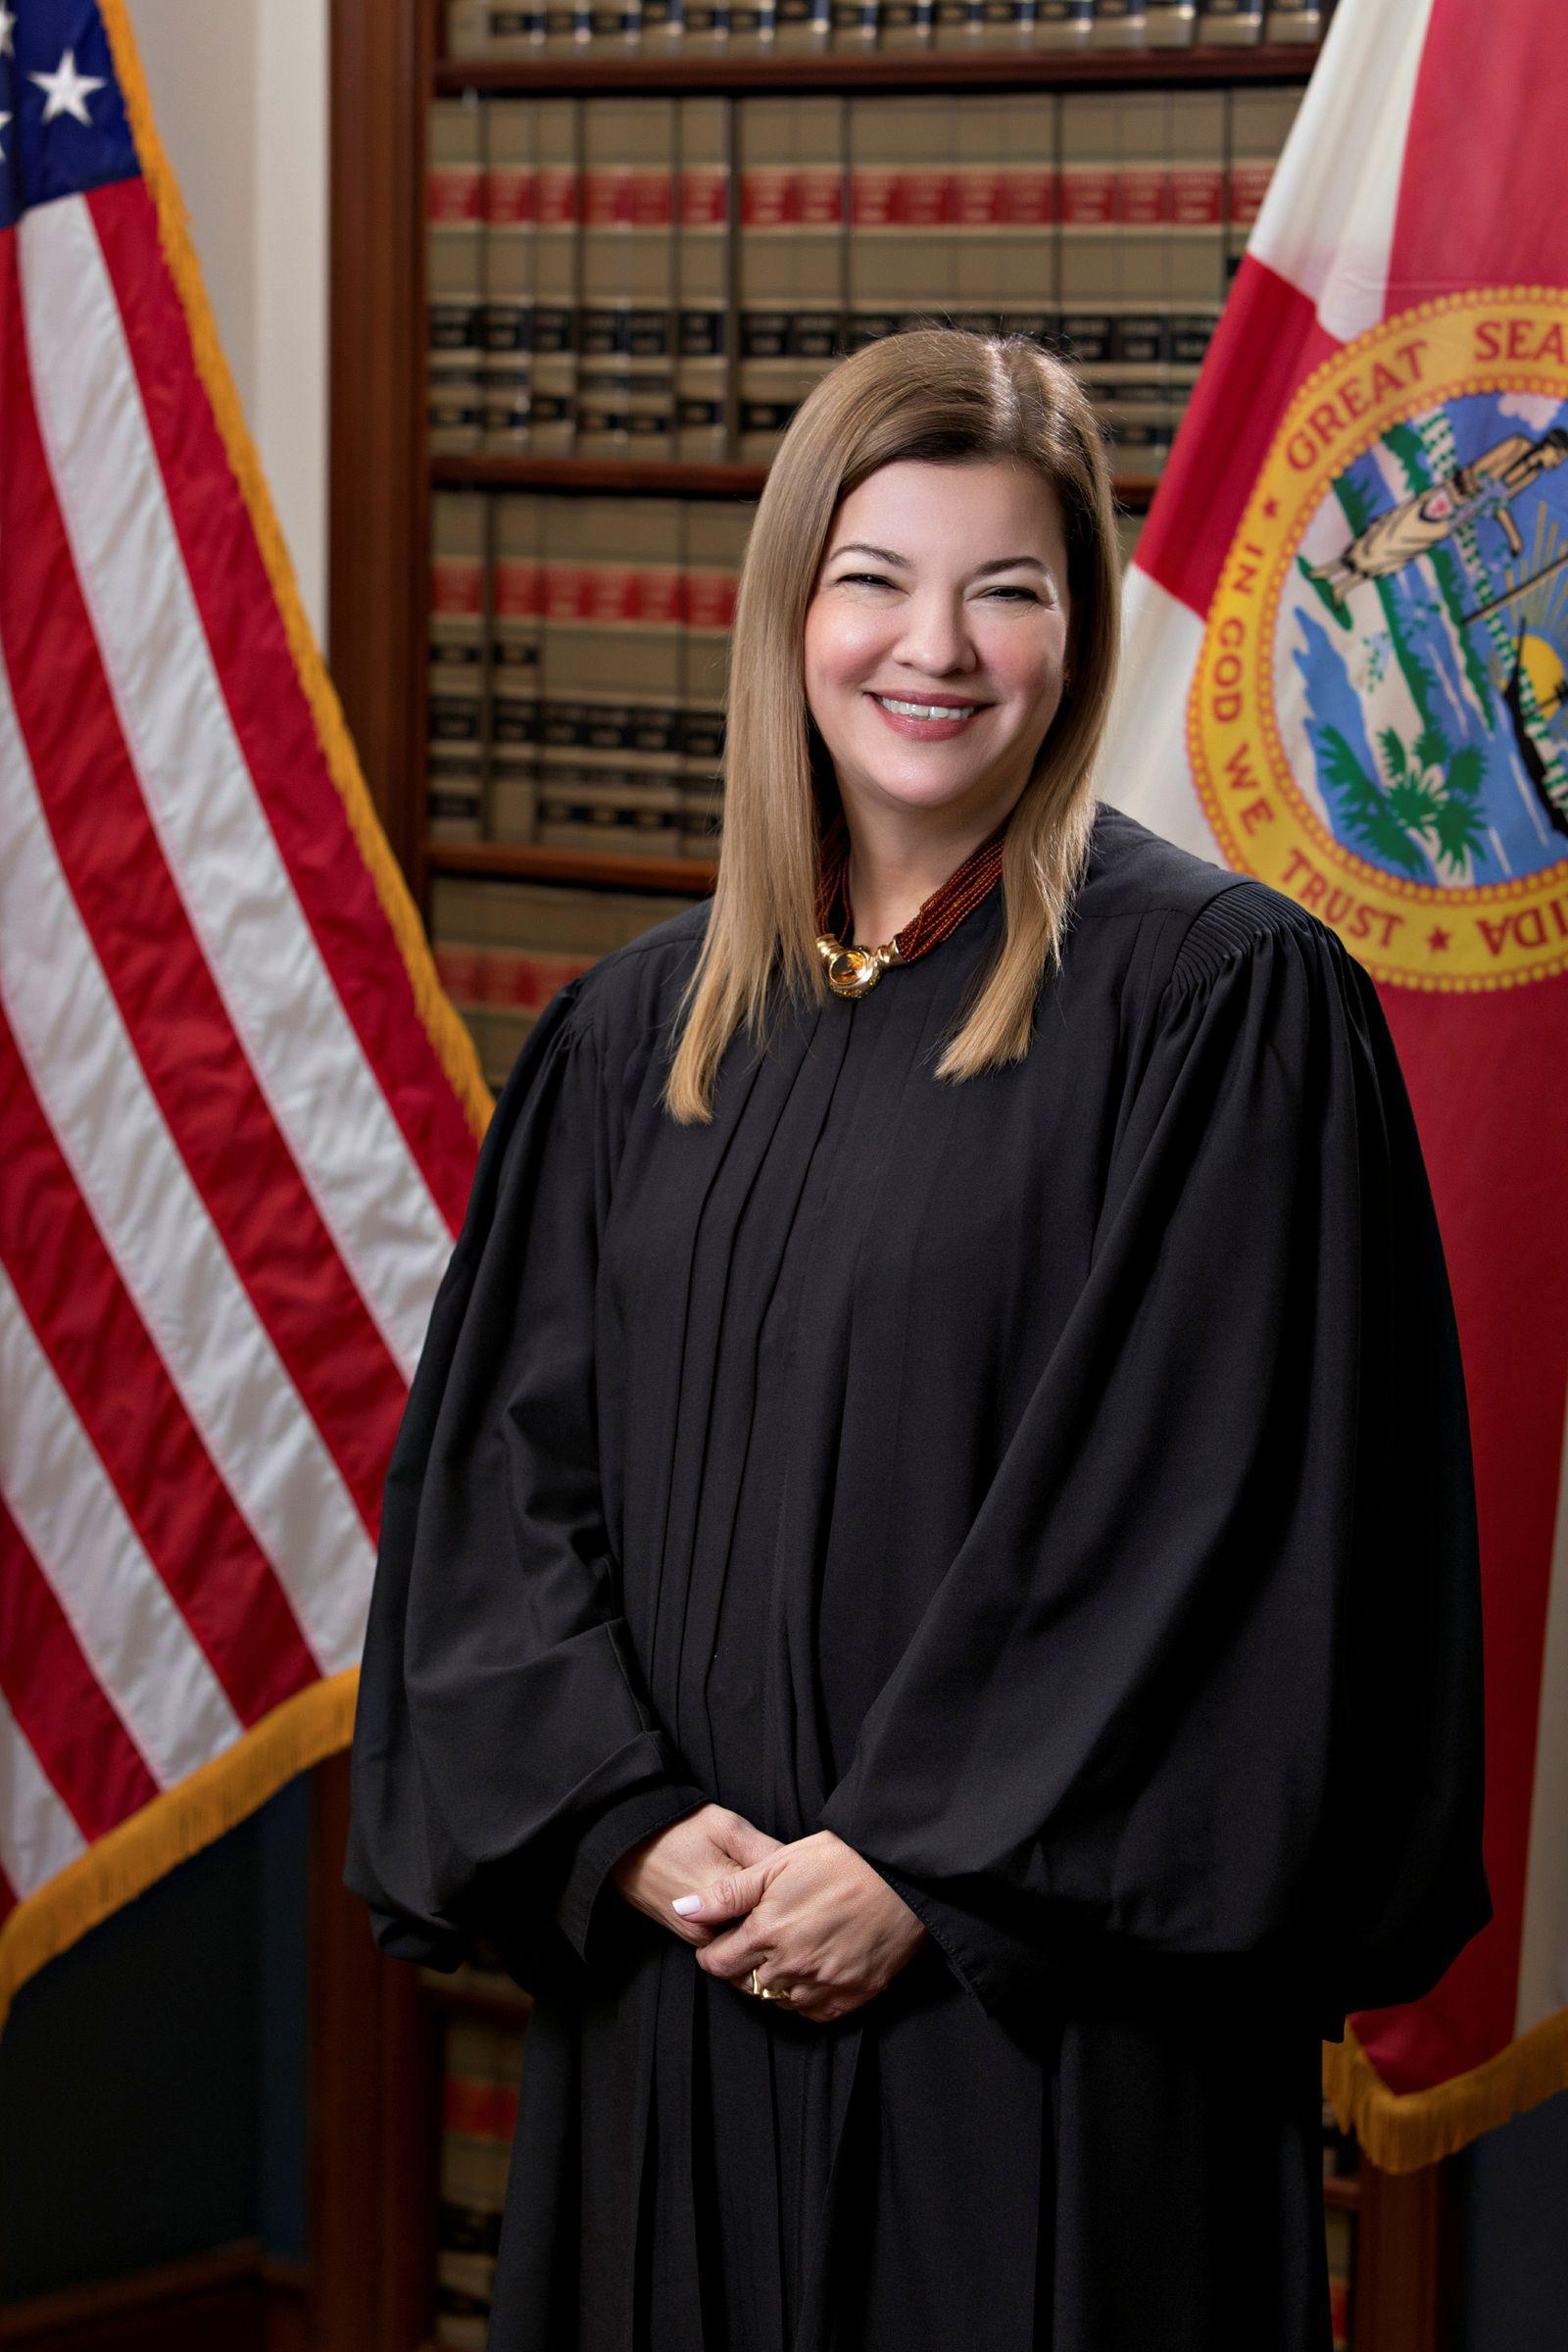 FILE PHOTO: Florida Supreme Court Justice Barbara Lagoa poses in an undated photograph